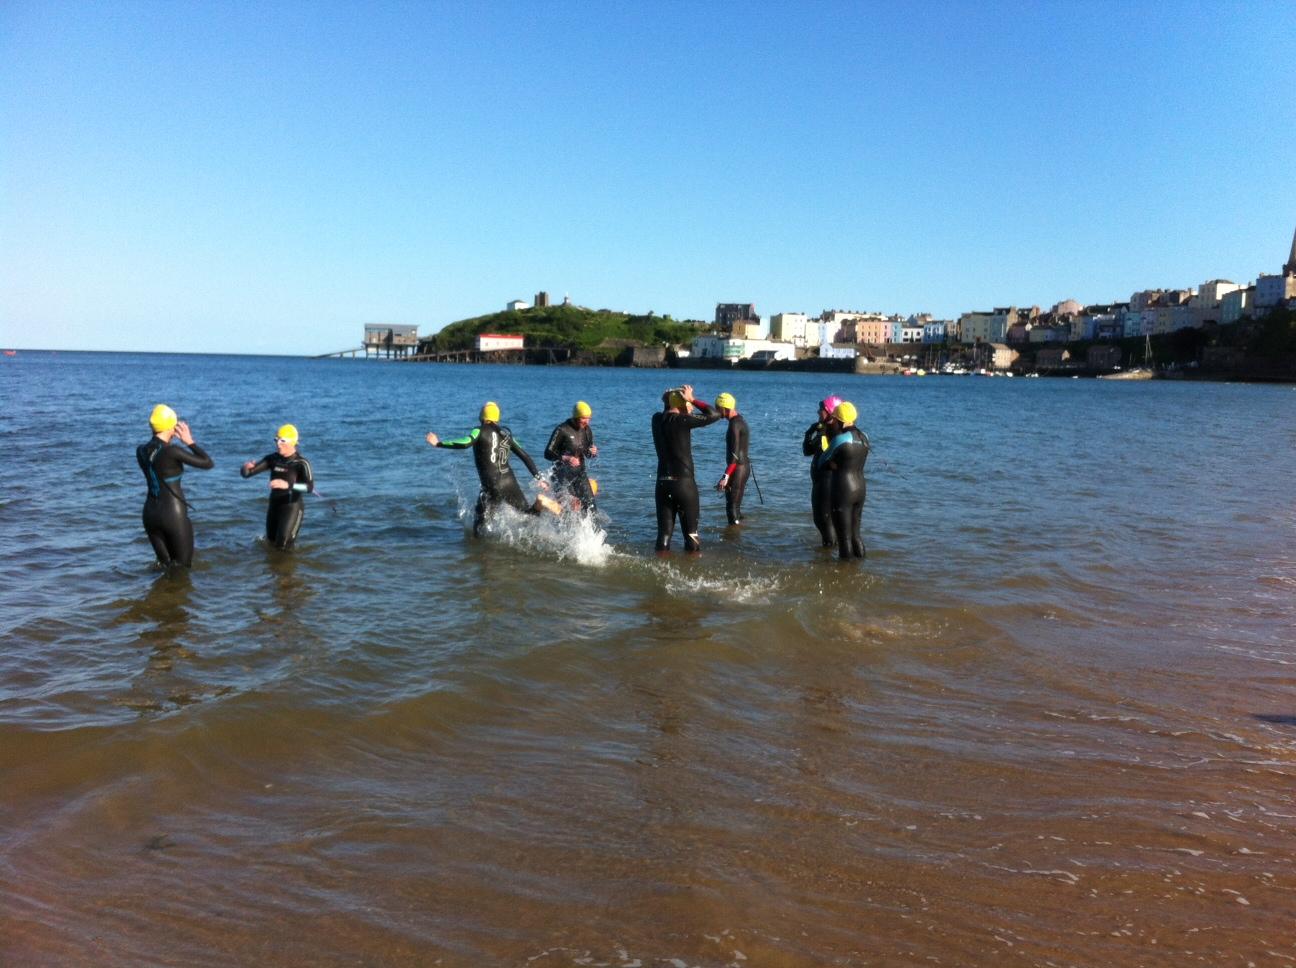 Tenby Caldey Swim Open Water Sea Swim From Caldey Island To Tenby